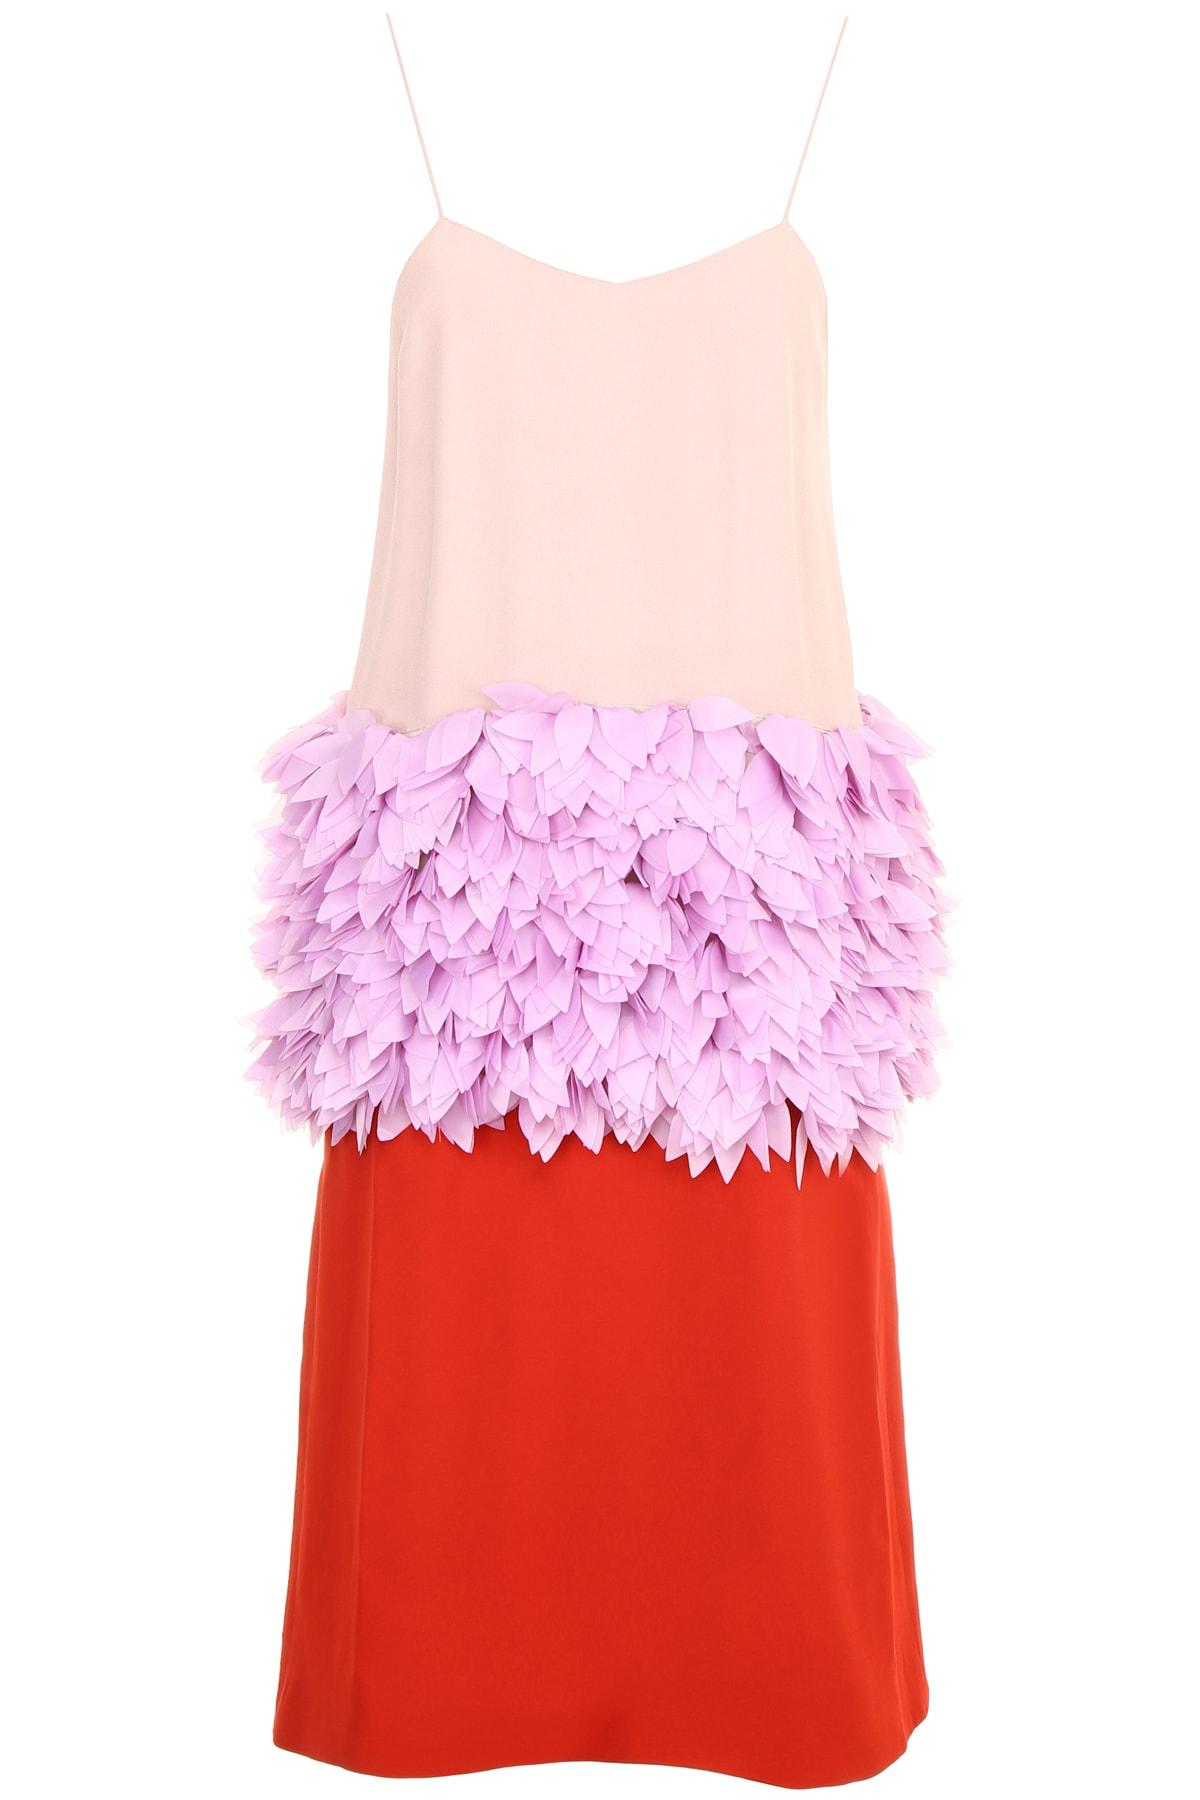 Marni Crepe Satin Dress